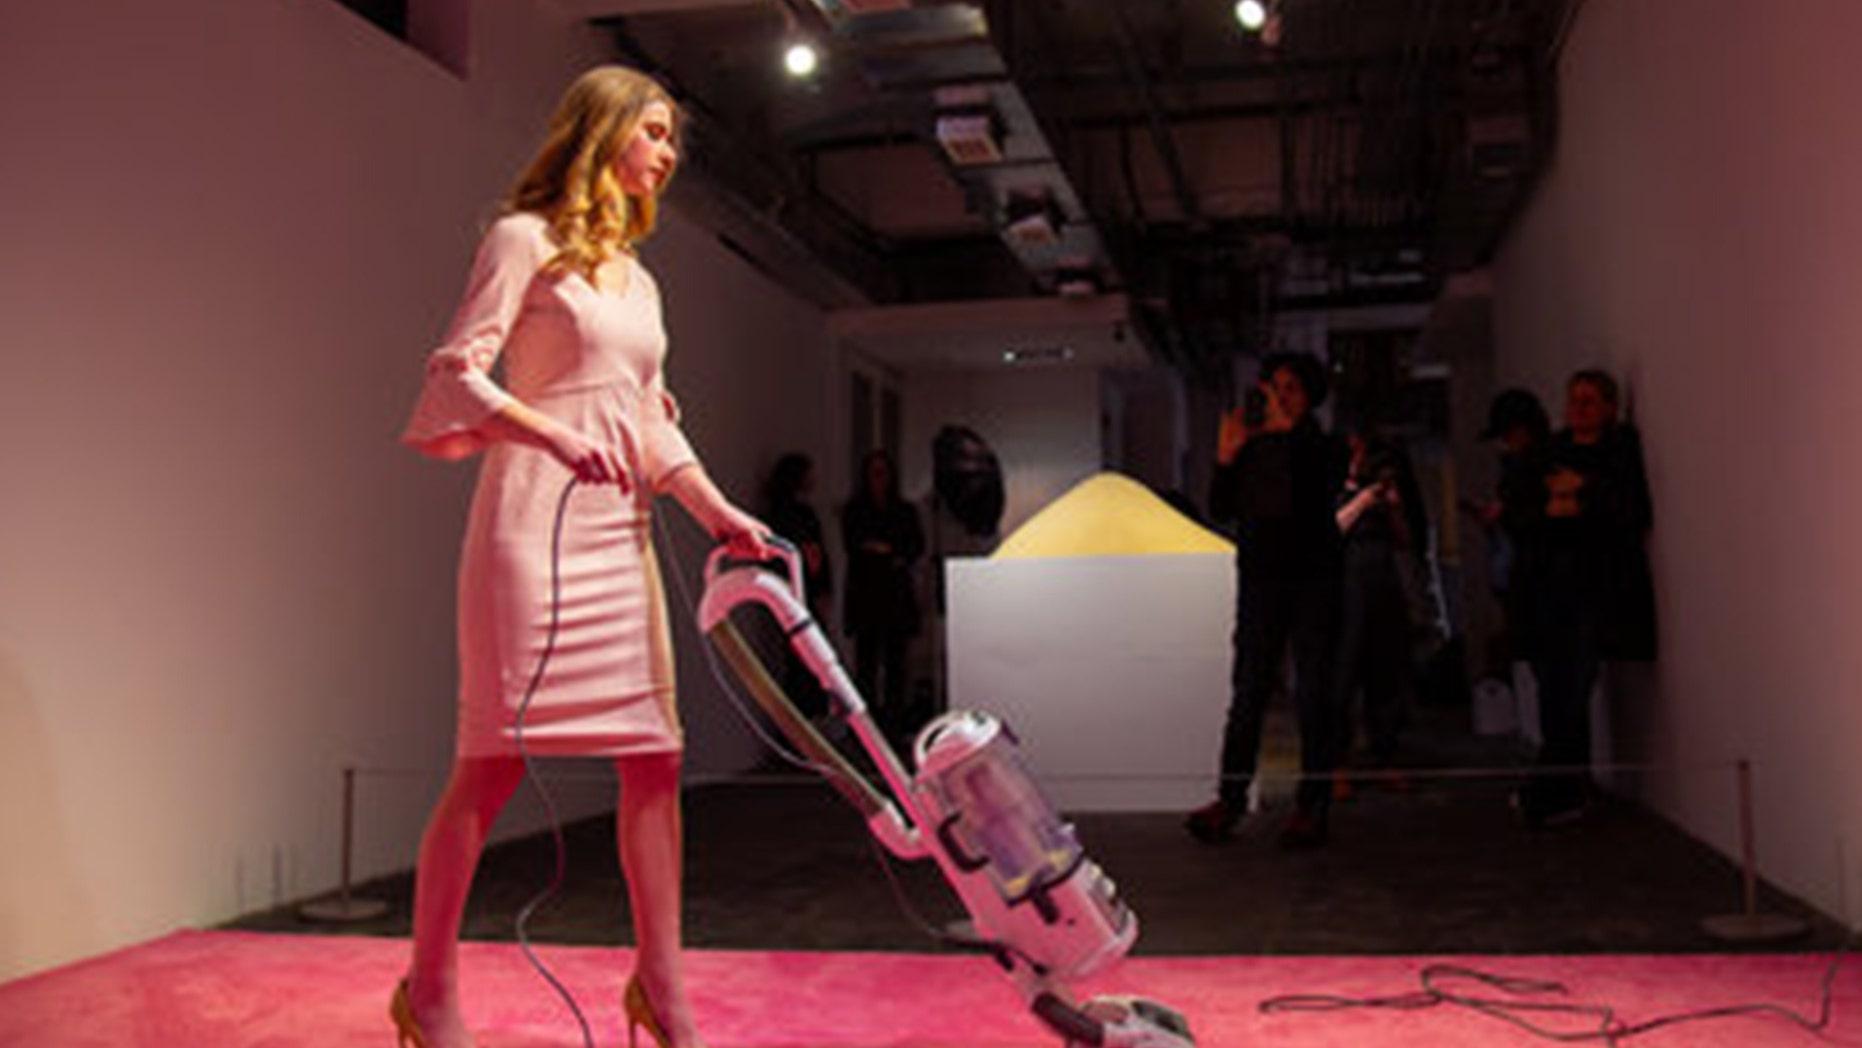 An Ivanka Trump look-alike vacuums at a recently launched art exhibit in Washington, D.C.(Ryan Maxwell Photography)